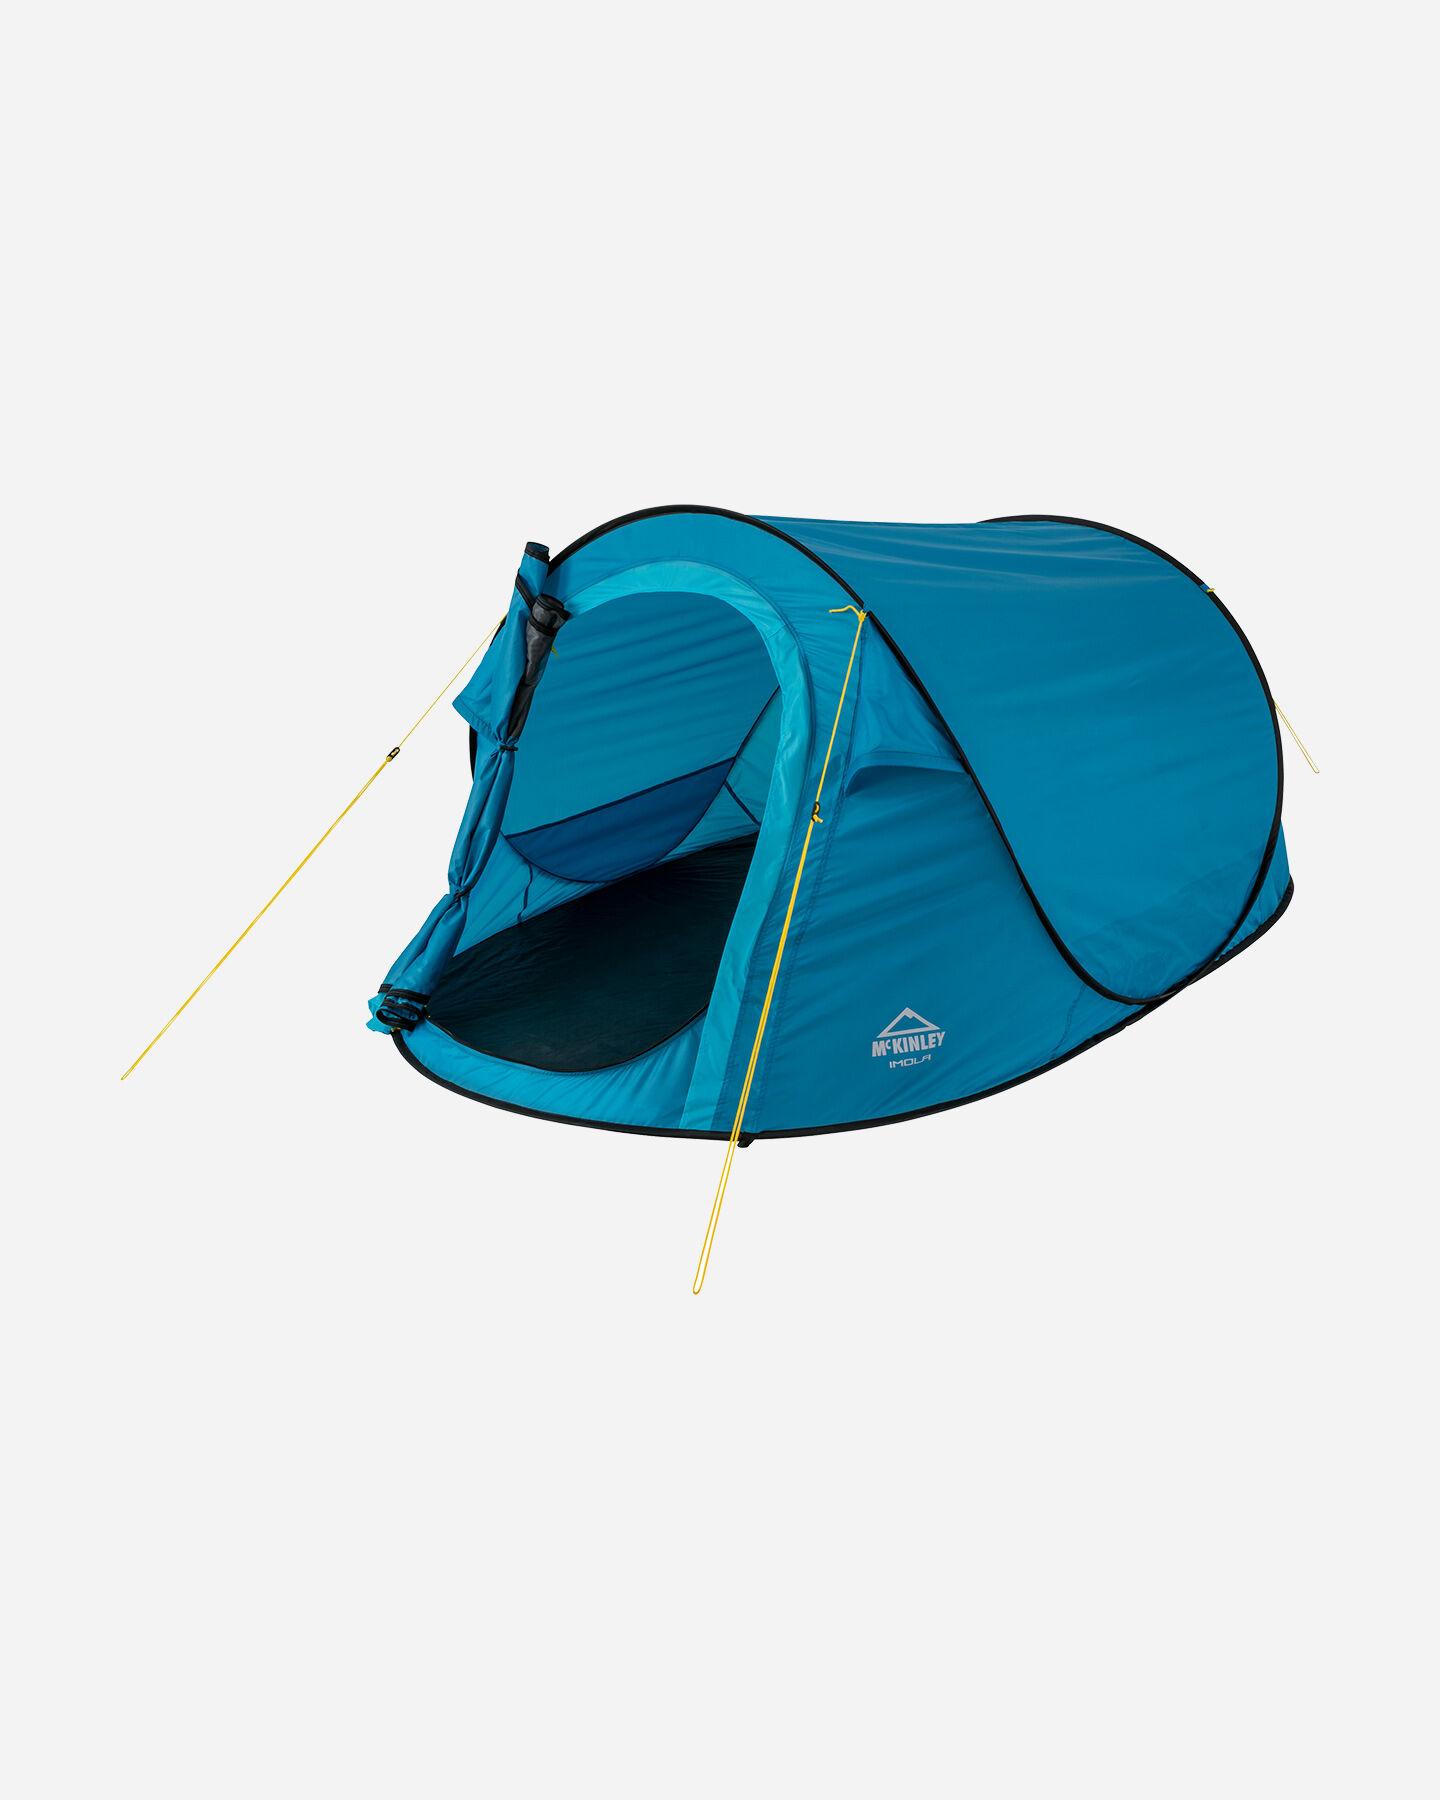 Tenda MCKINLEY IMOLA 220 POP UP S1315825|1|UNI scatto 0